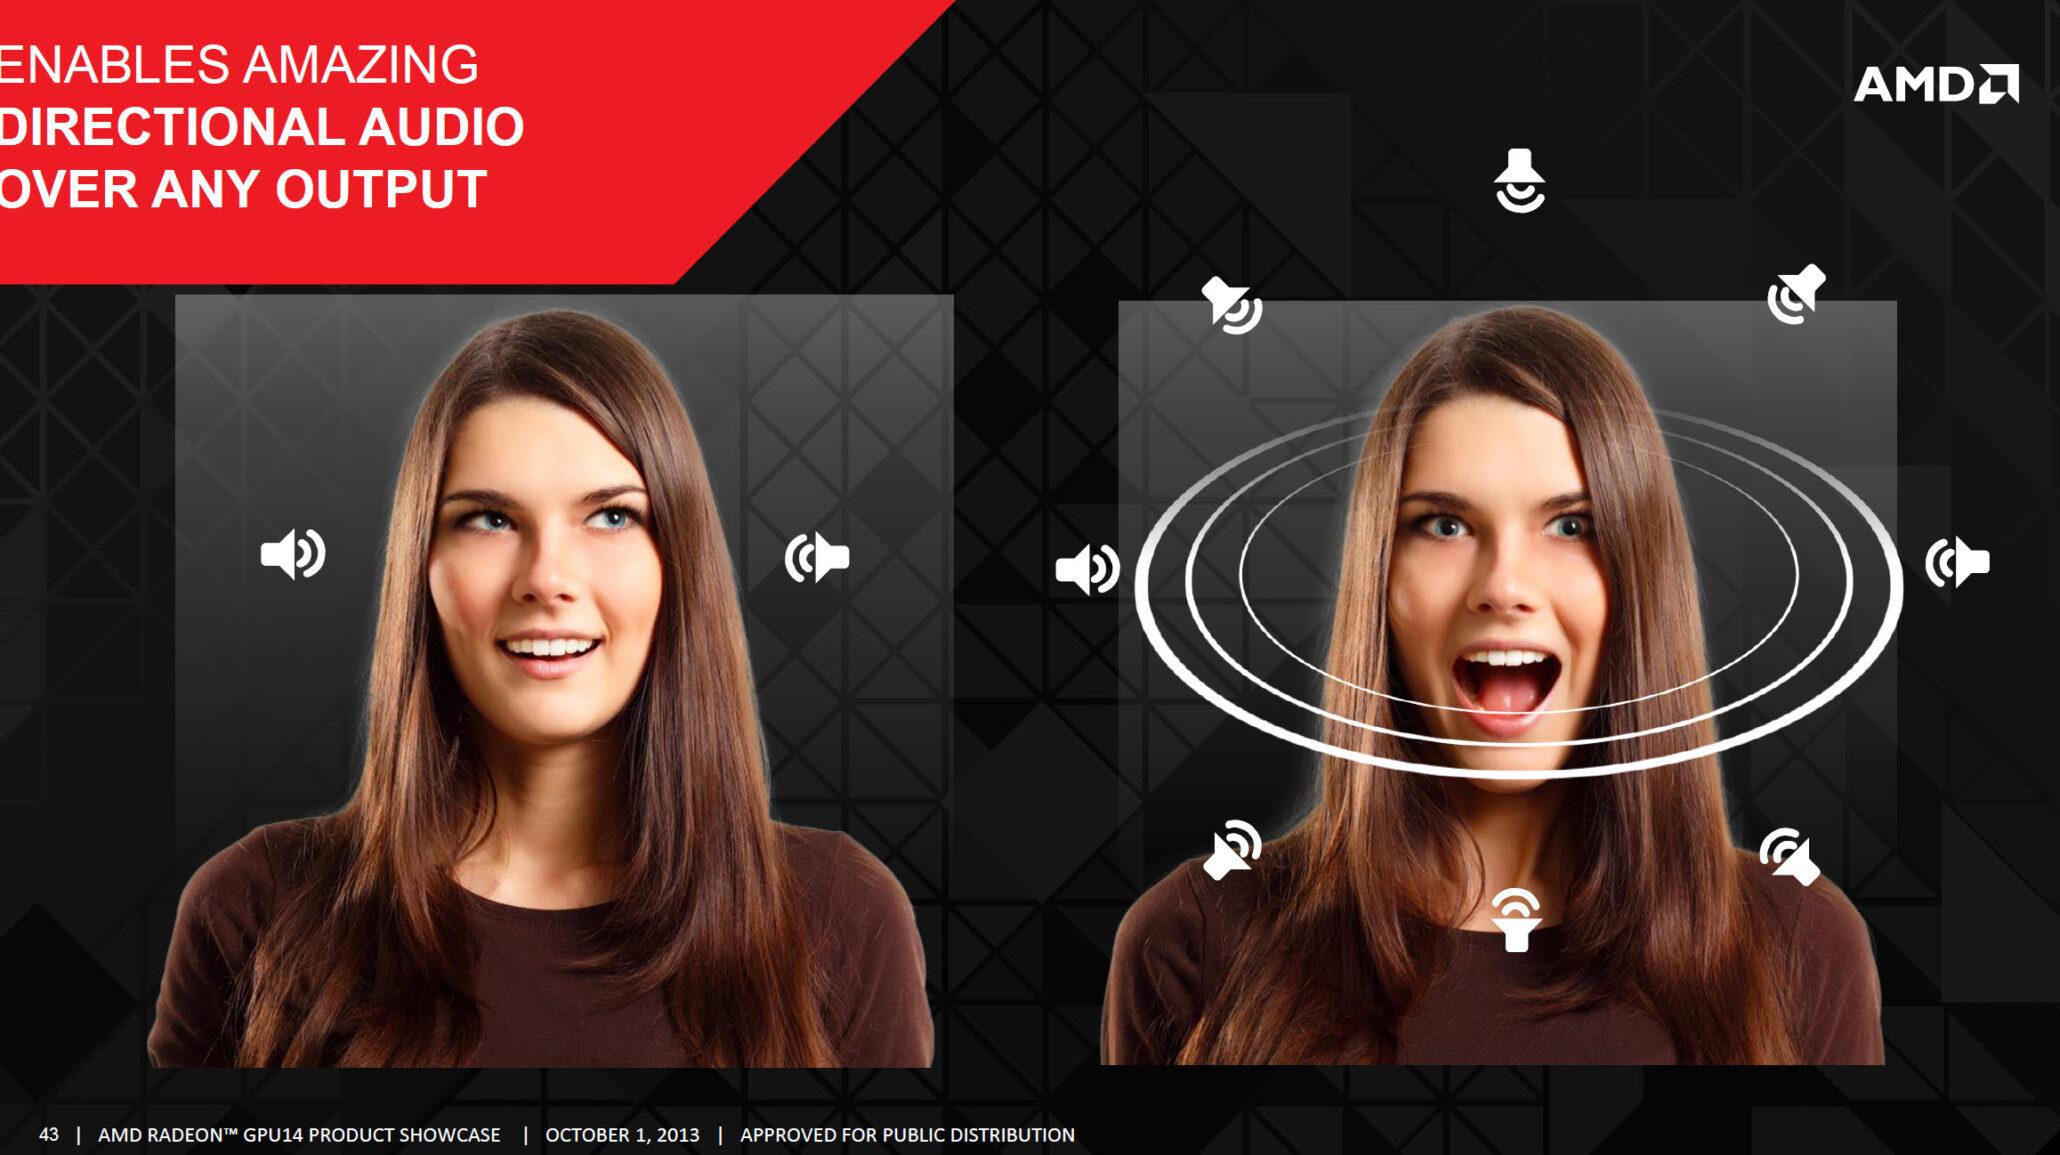 amd-trueaudio-directional-audio